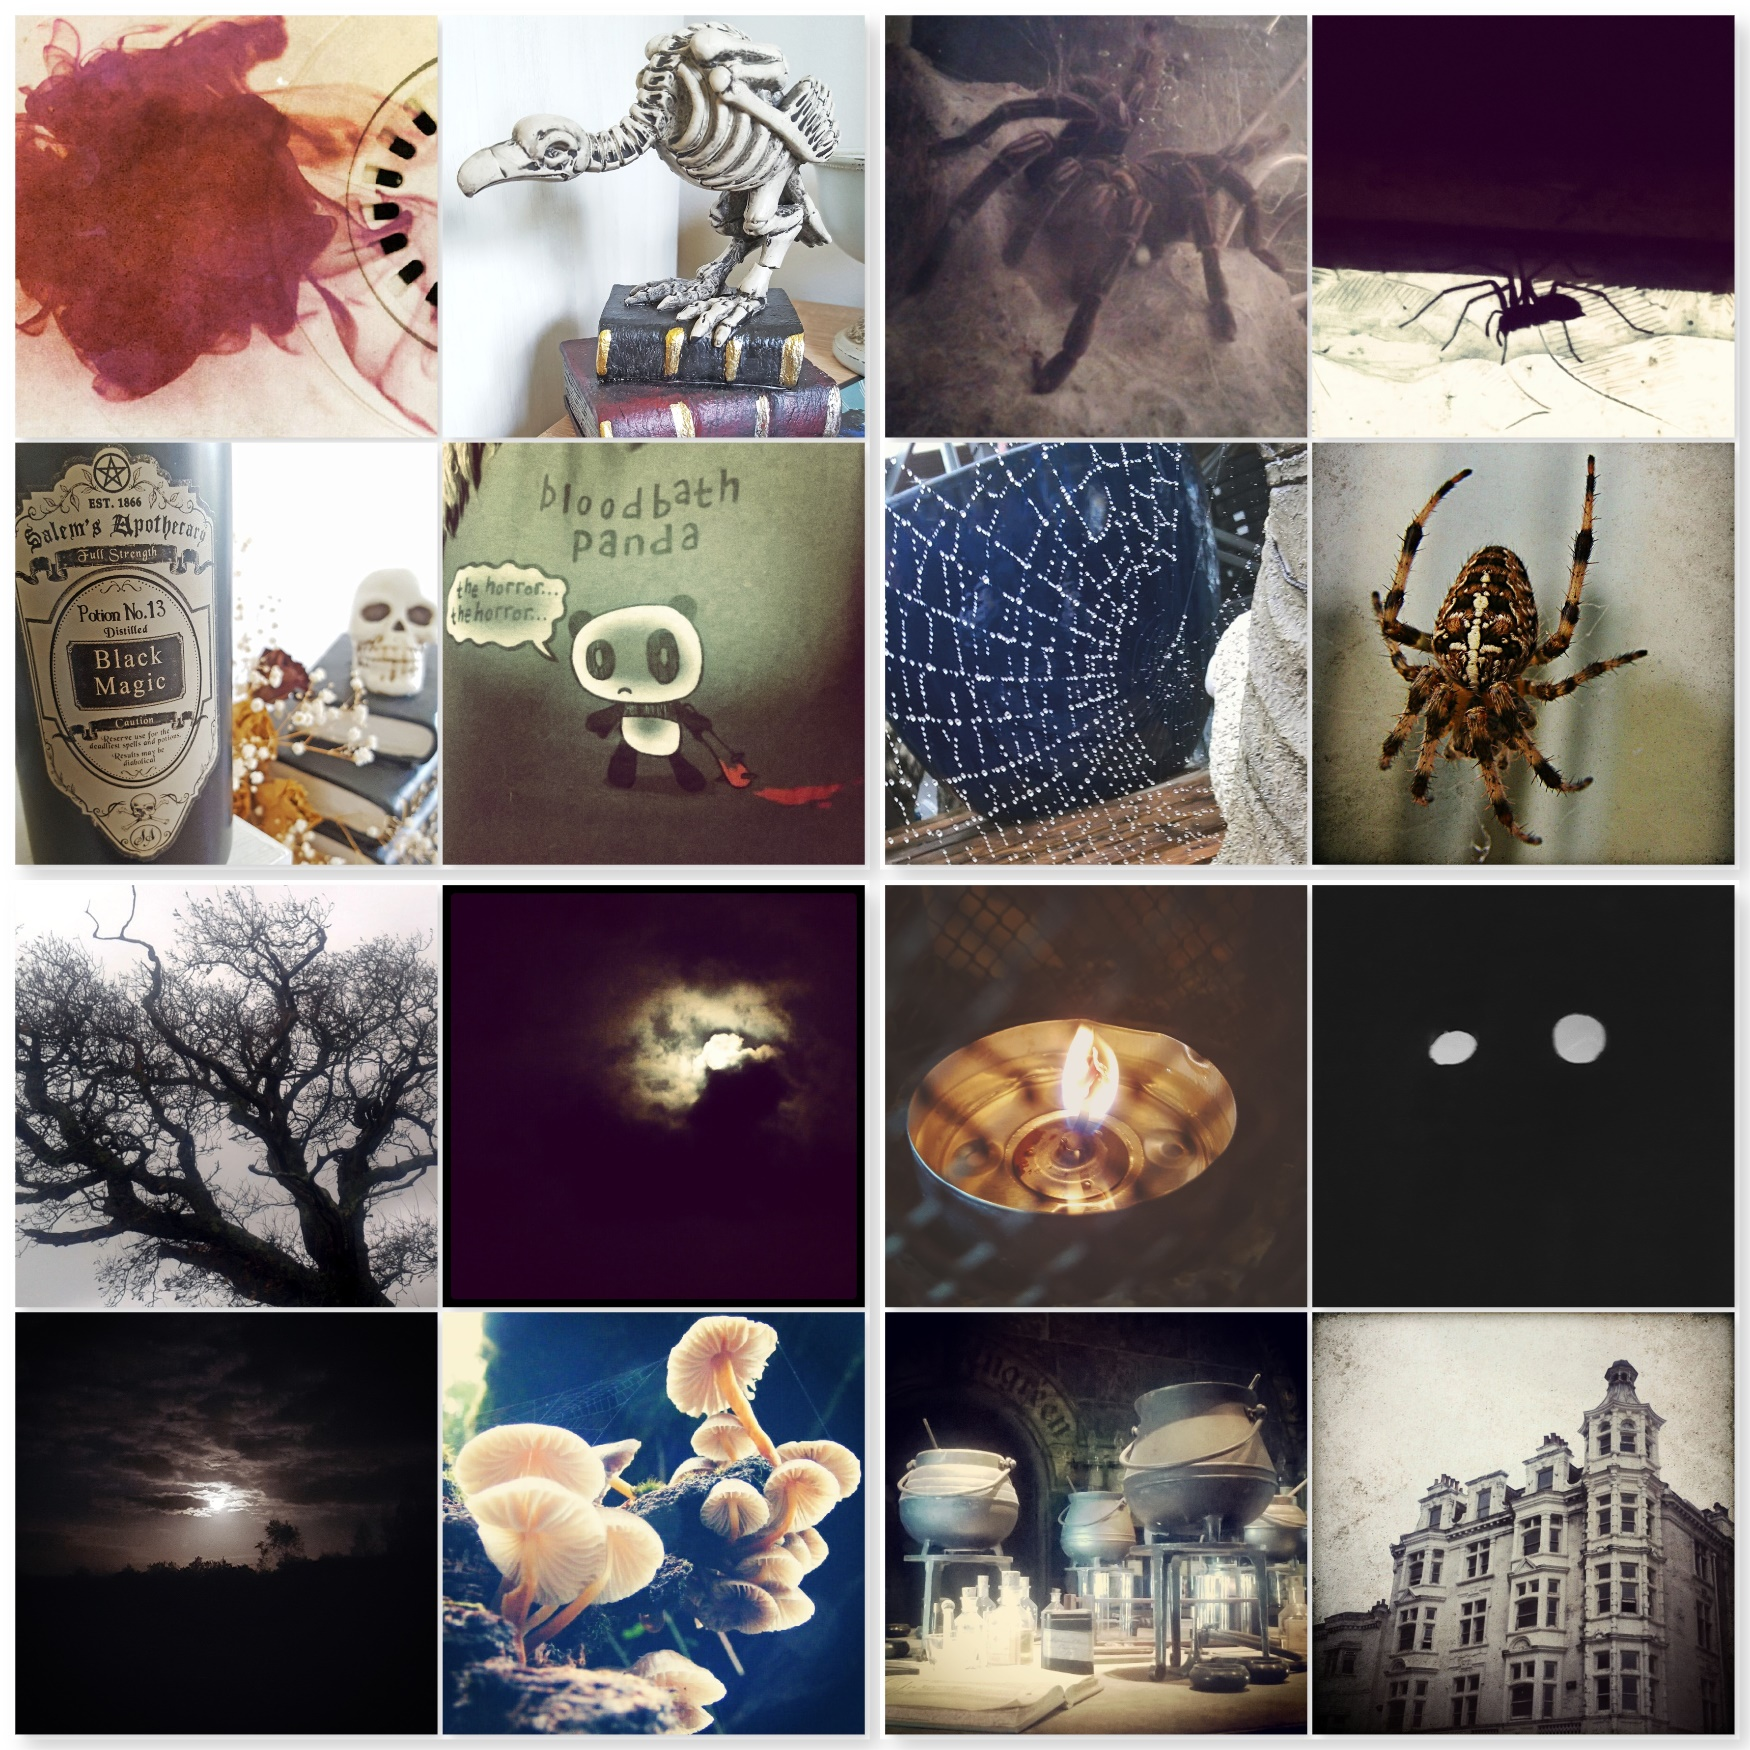 Halloween - Blood, Skeletons, Magic, Moon, Trees, Haunted House, Cauldrons - The Beast Bits of Halloween - The Last Krystallos